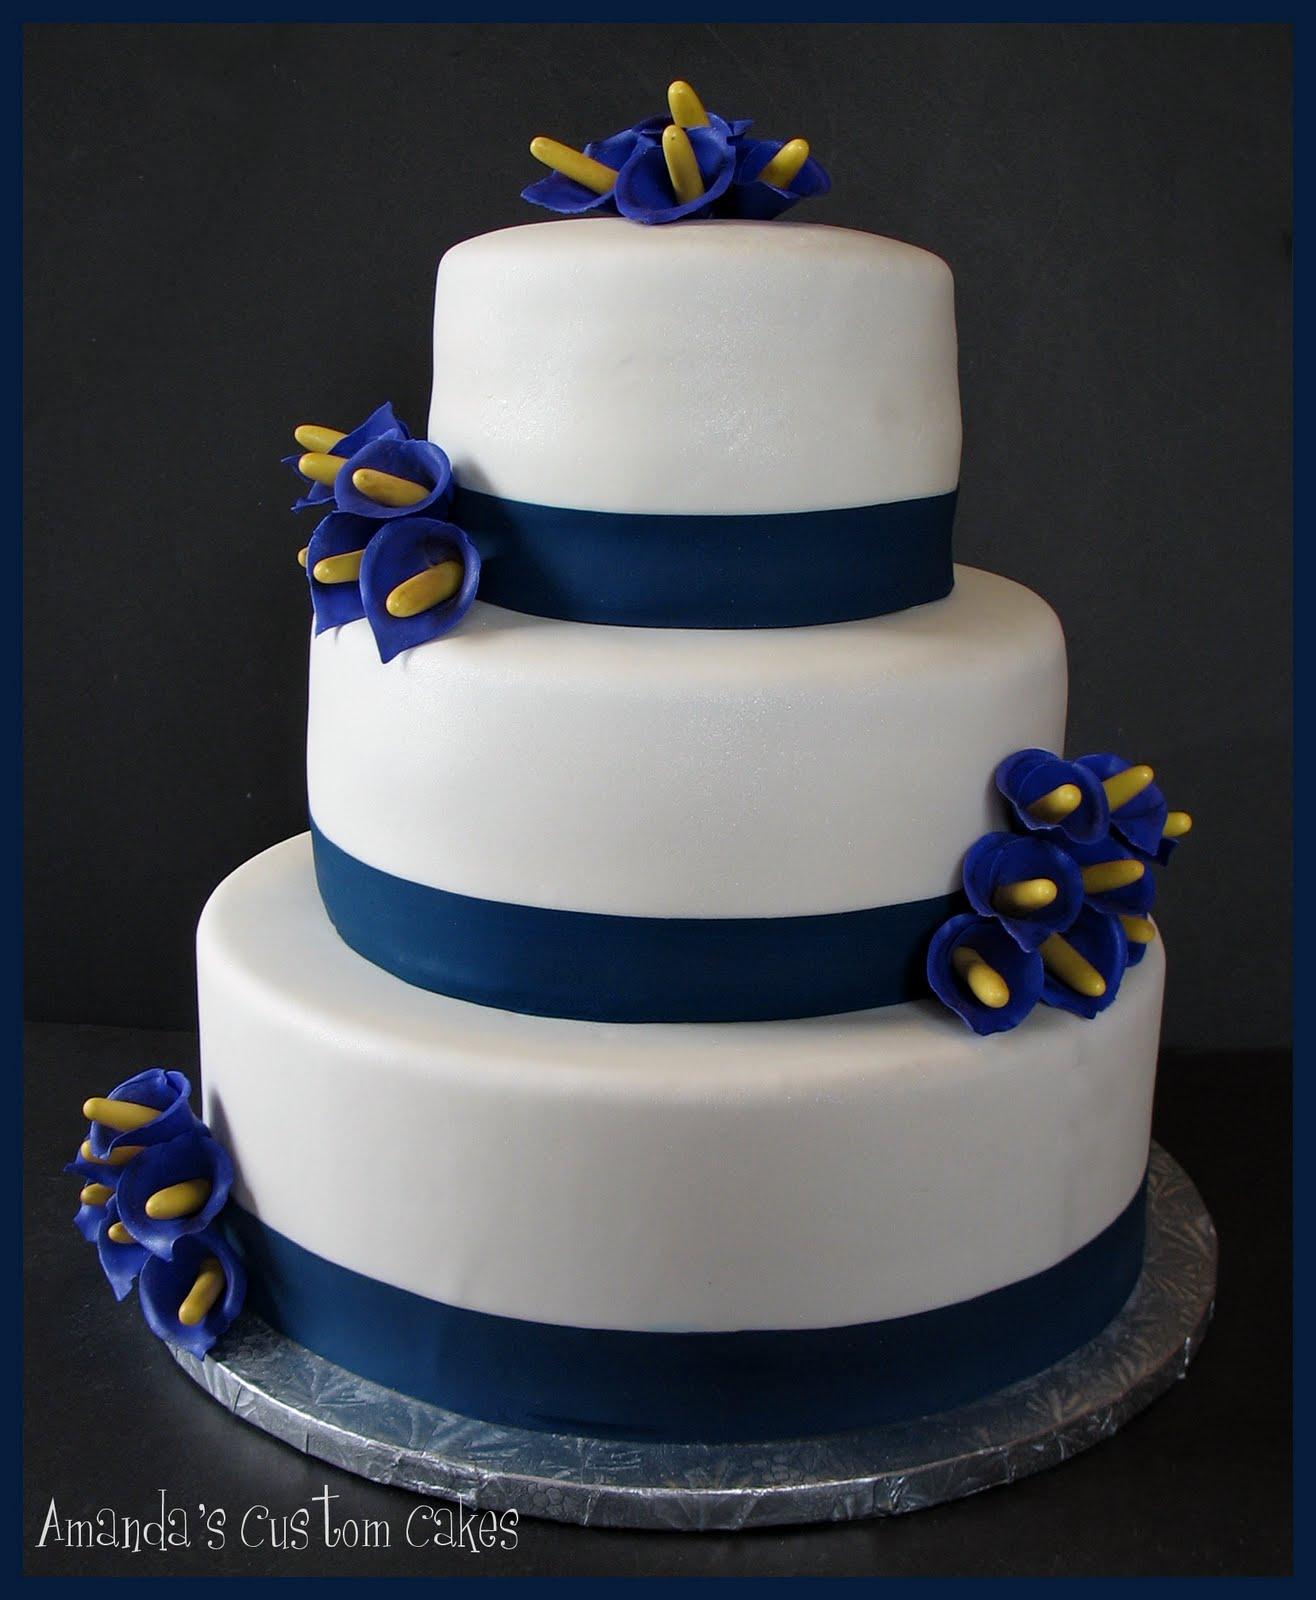 Amandas Custom Cakes Calla Lily Wedding Cake - Calla Lilly Wedding Cake